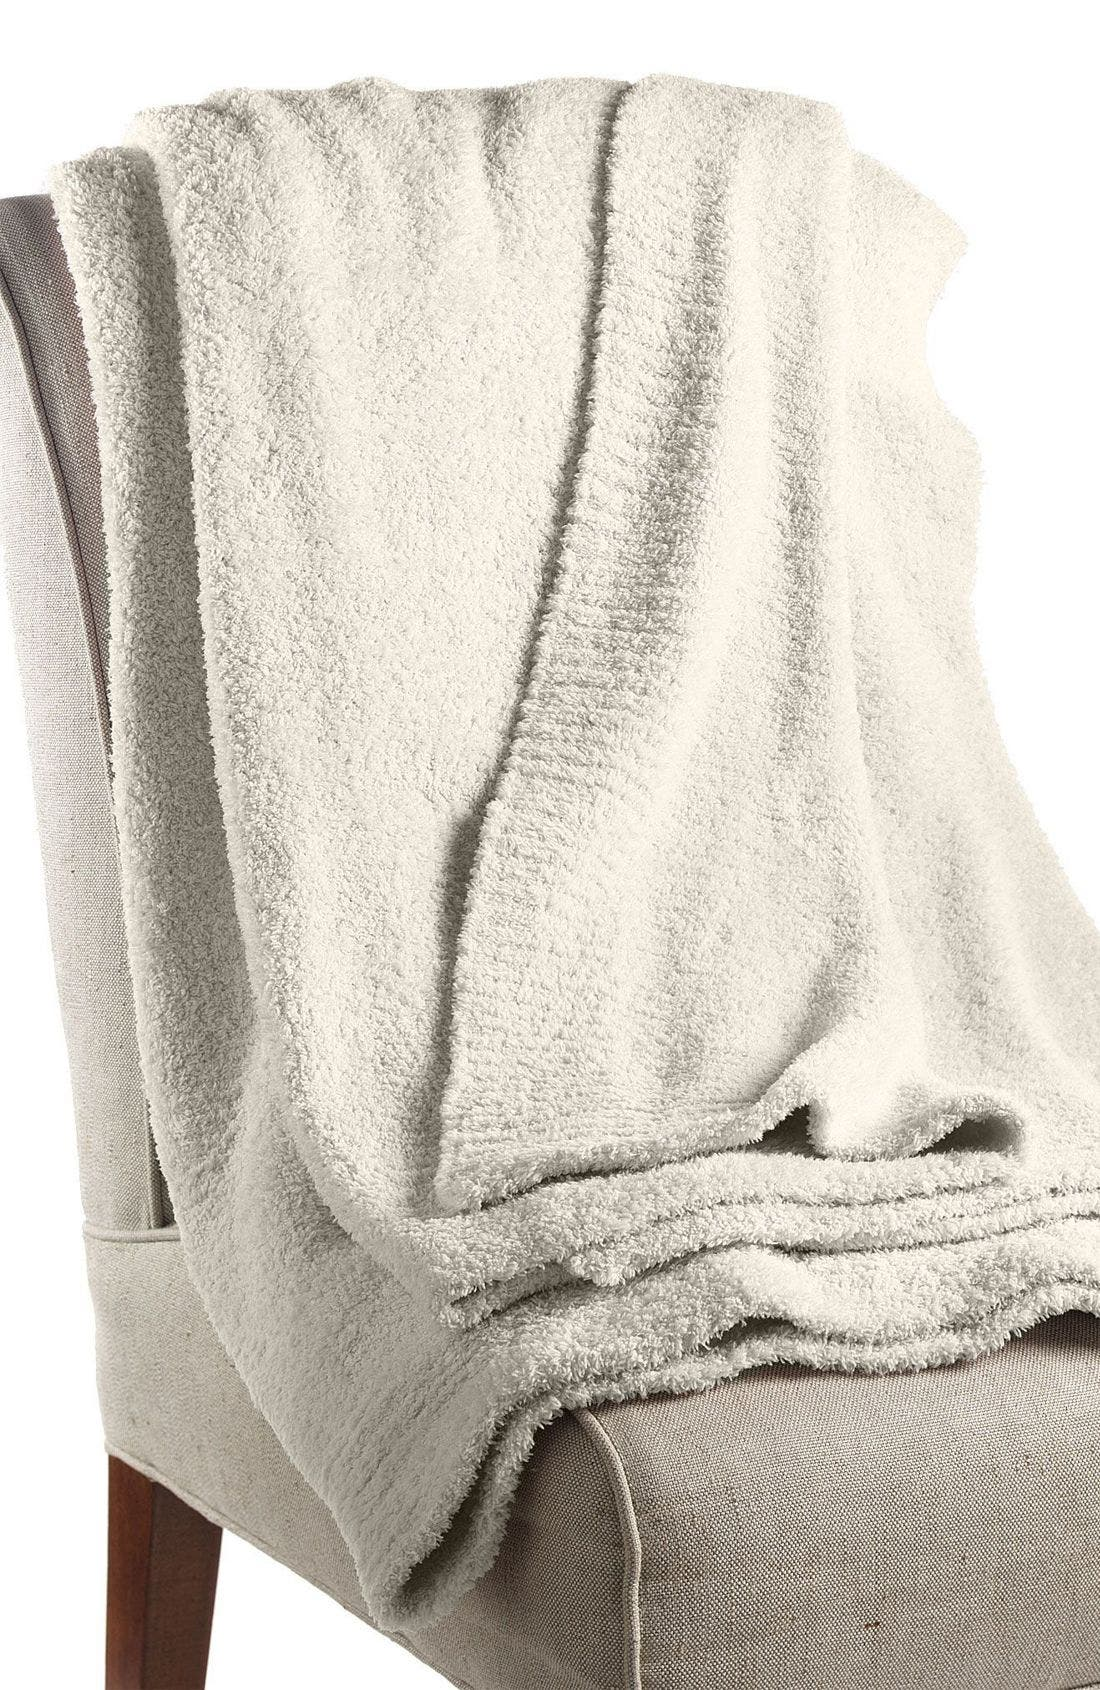 Alternate Image 1 Selected - Barefoot Dreams® Chic Blanket